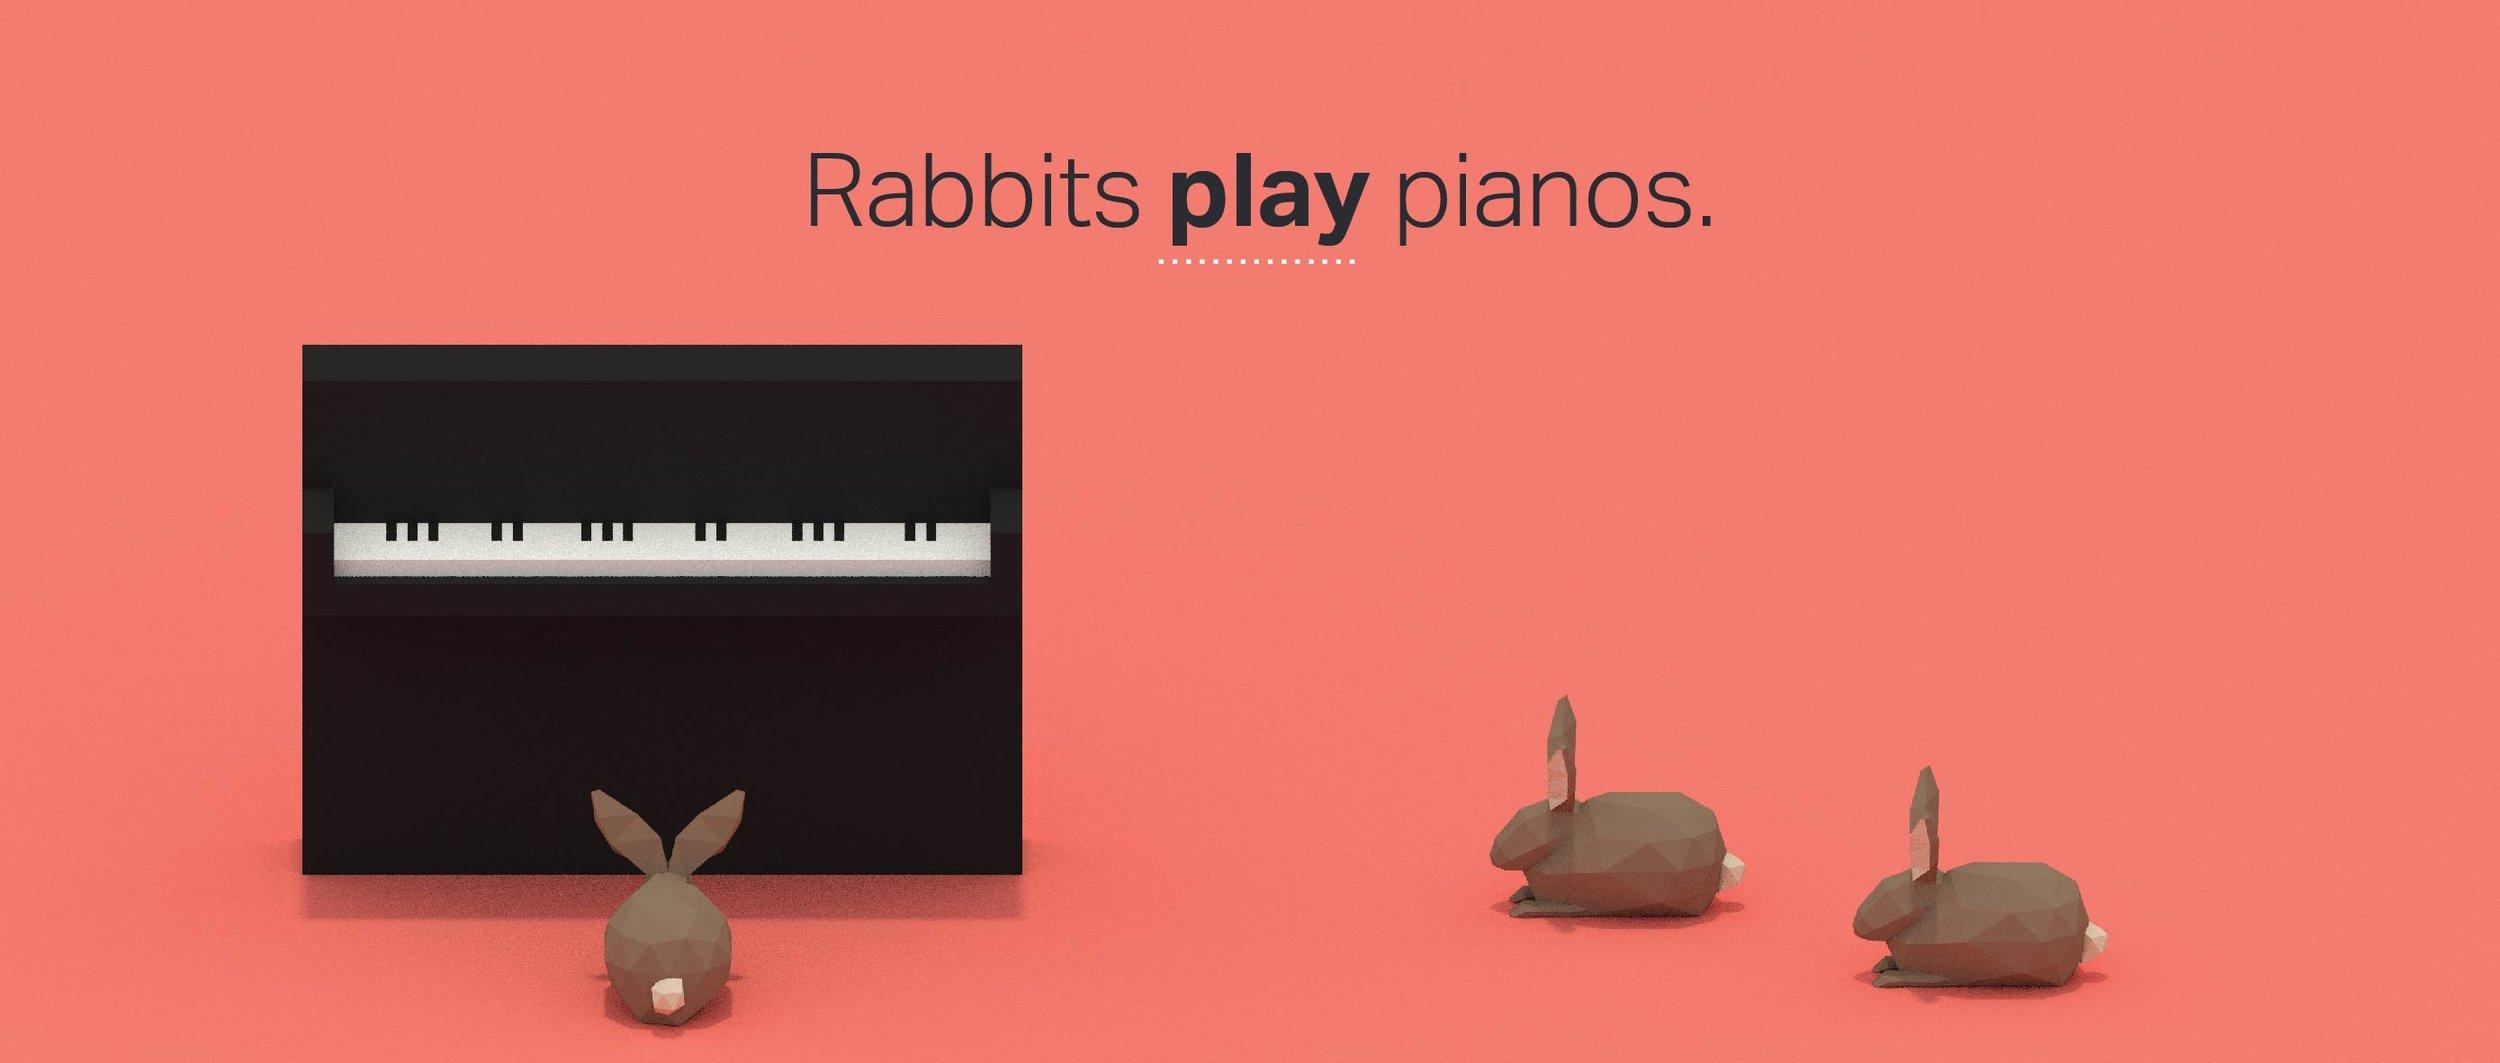 RabbitsPlayPianos-20x8-01.jpg